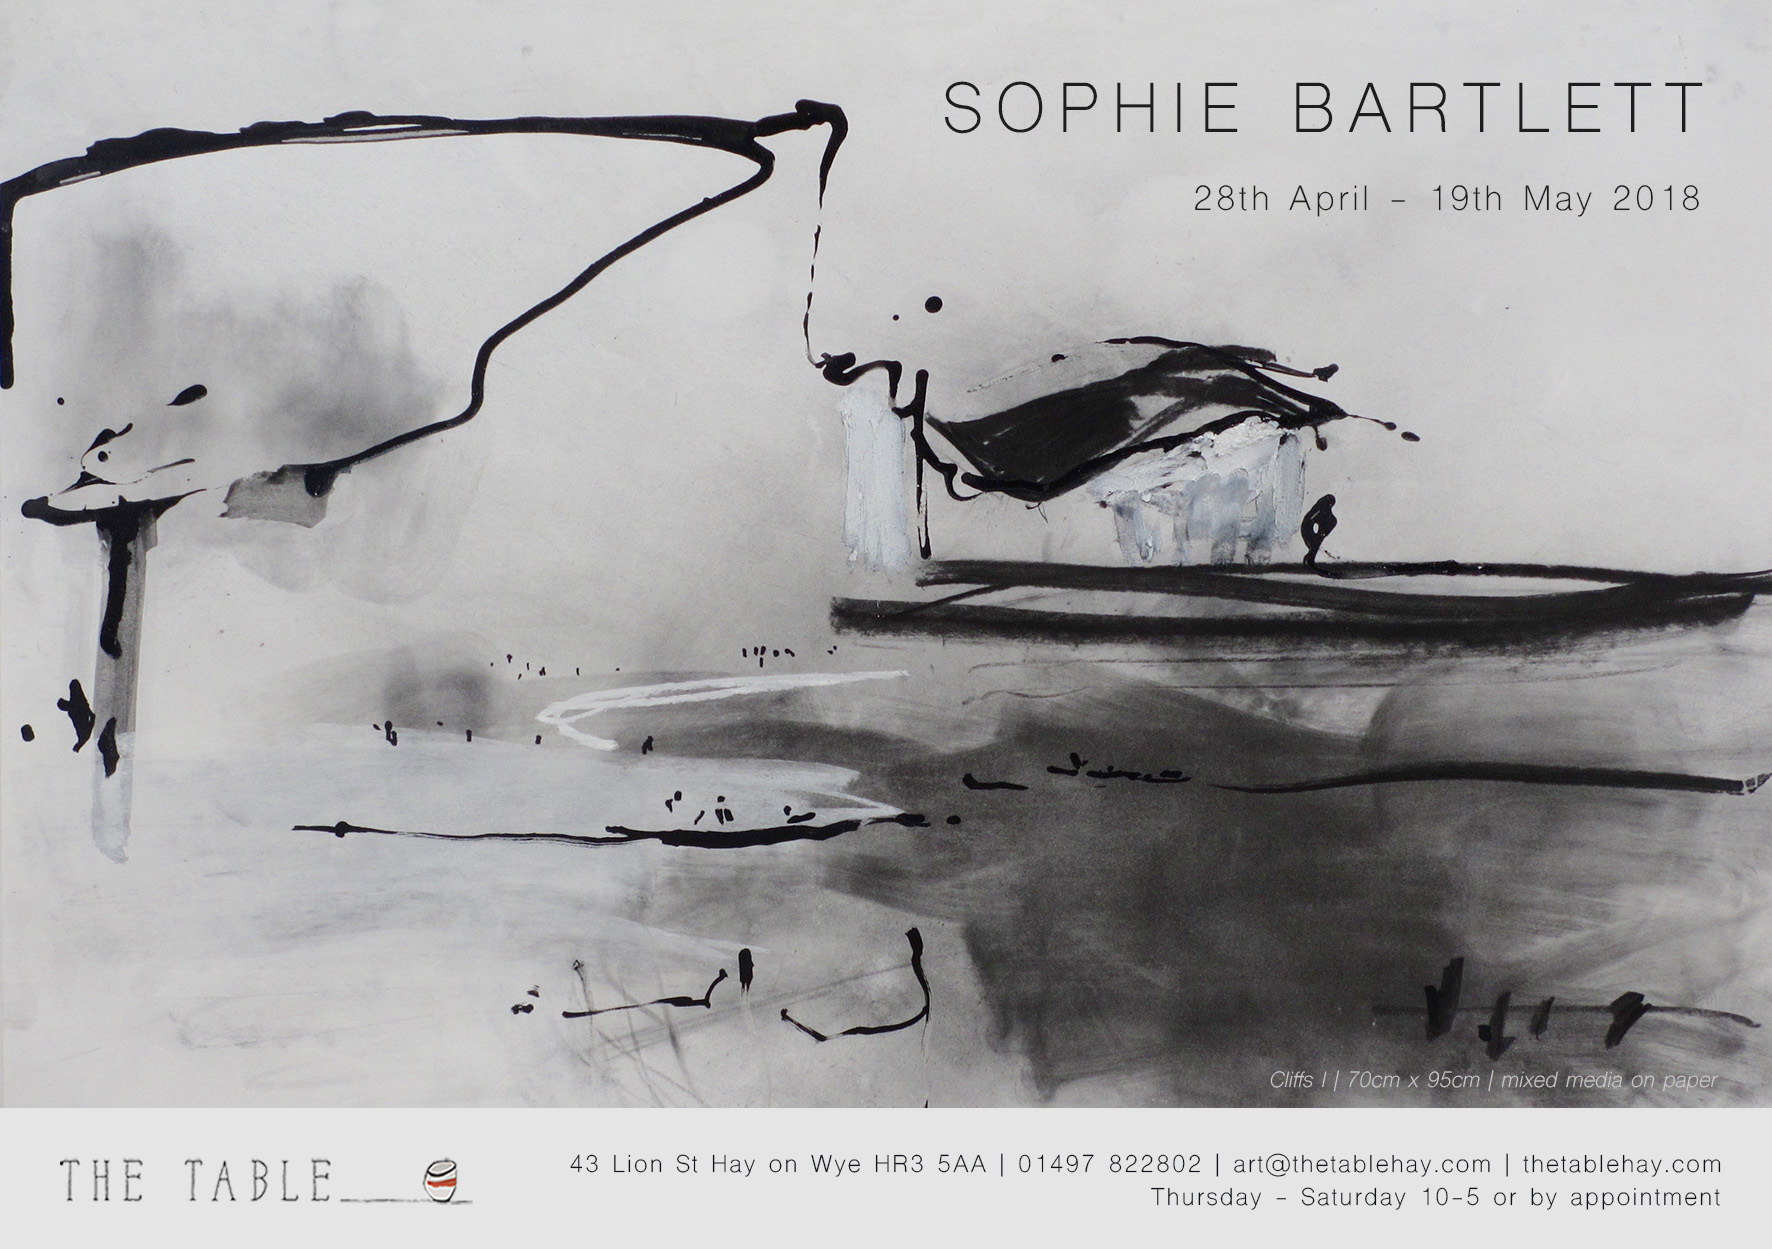 SophieBartlettFront.jpg